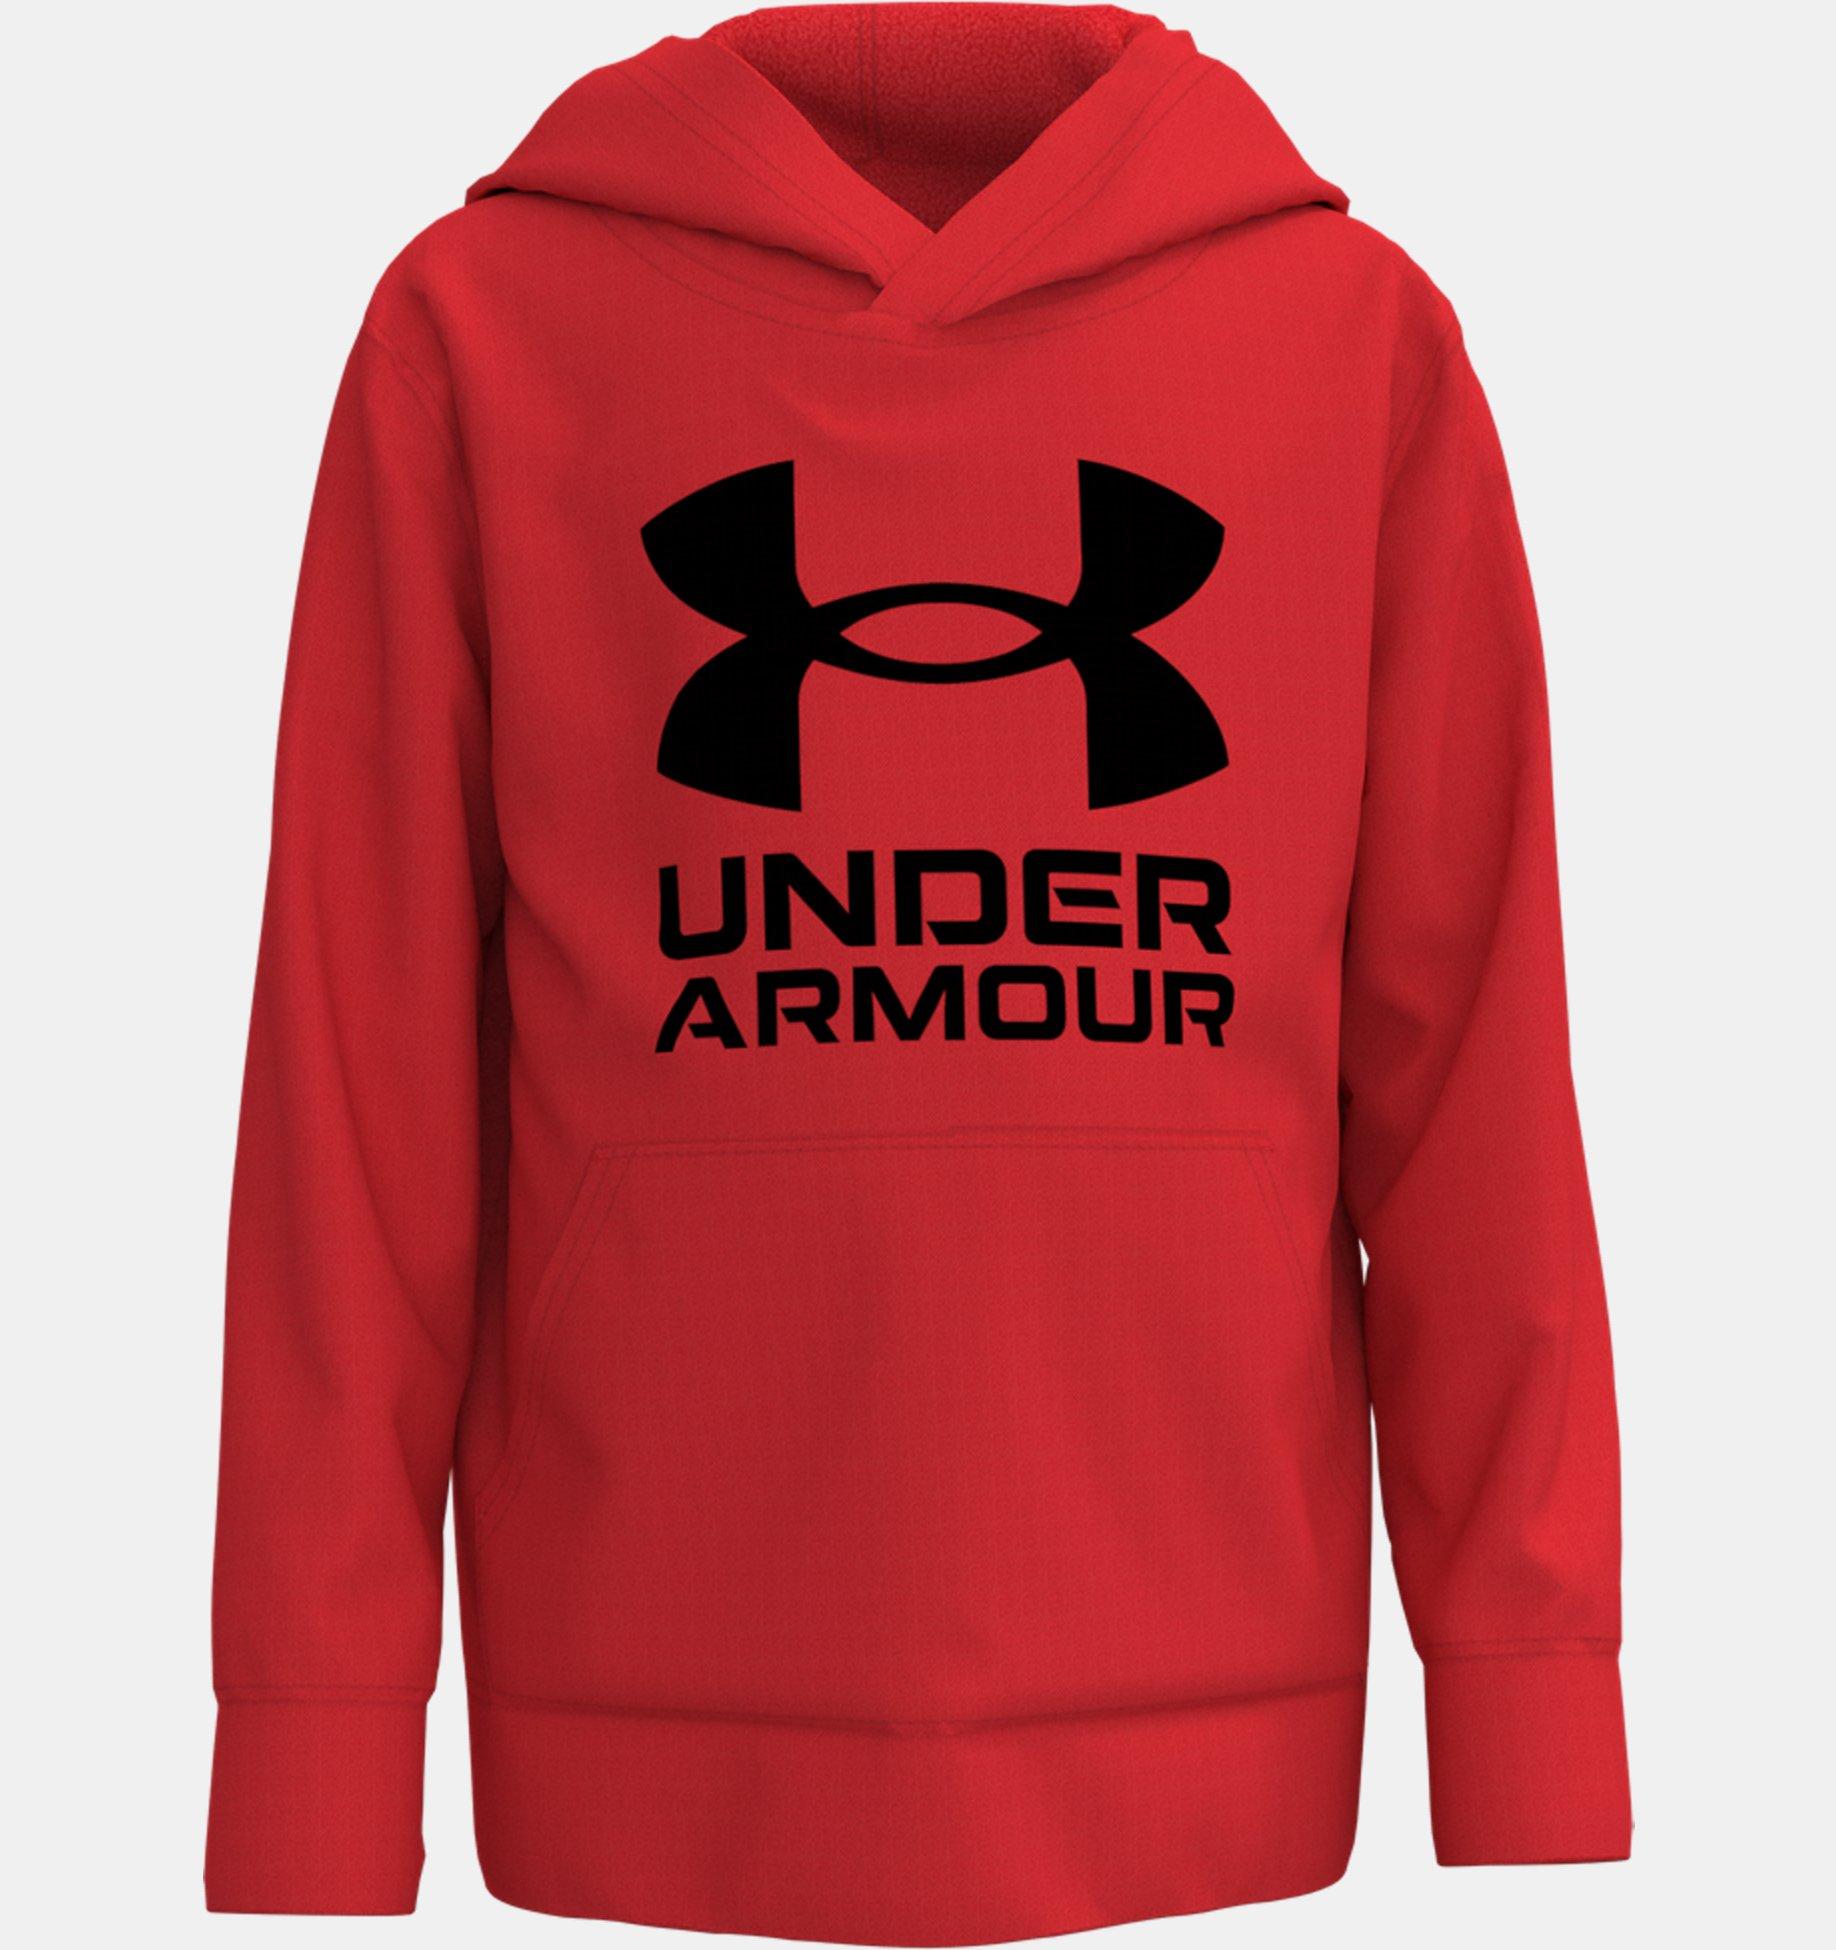 Underarmour Boys Toddler UA Symbol Hoodie